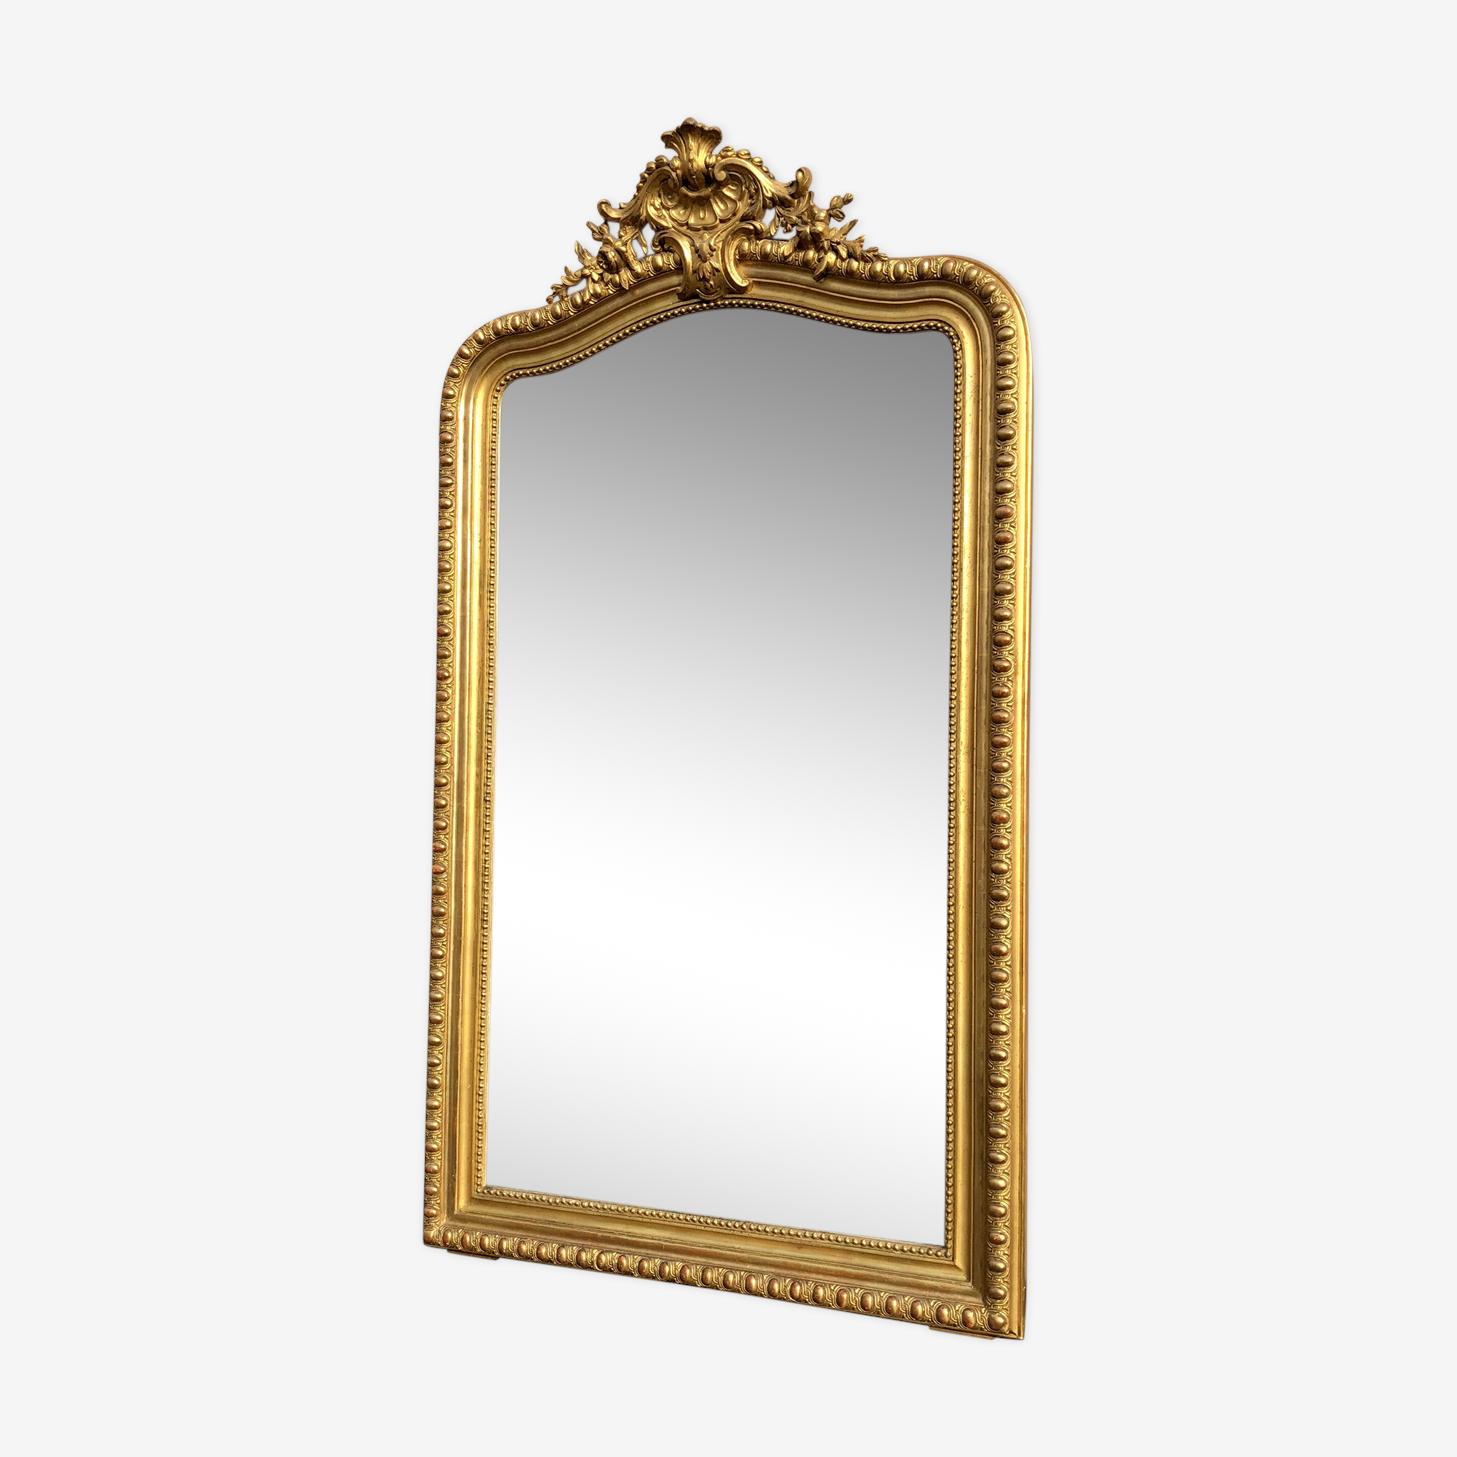 Large mirror 150 x 85 CM former gilding sheet d gold napoleon III